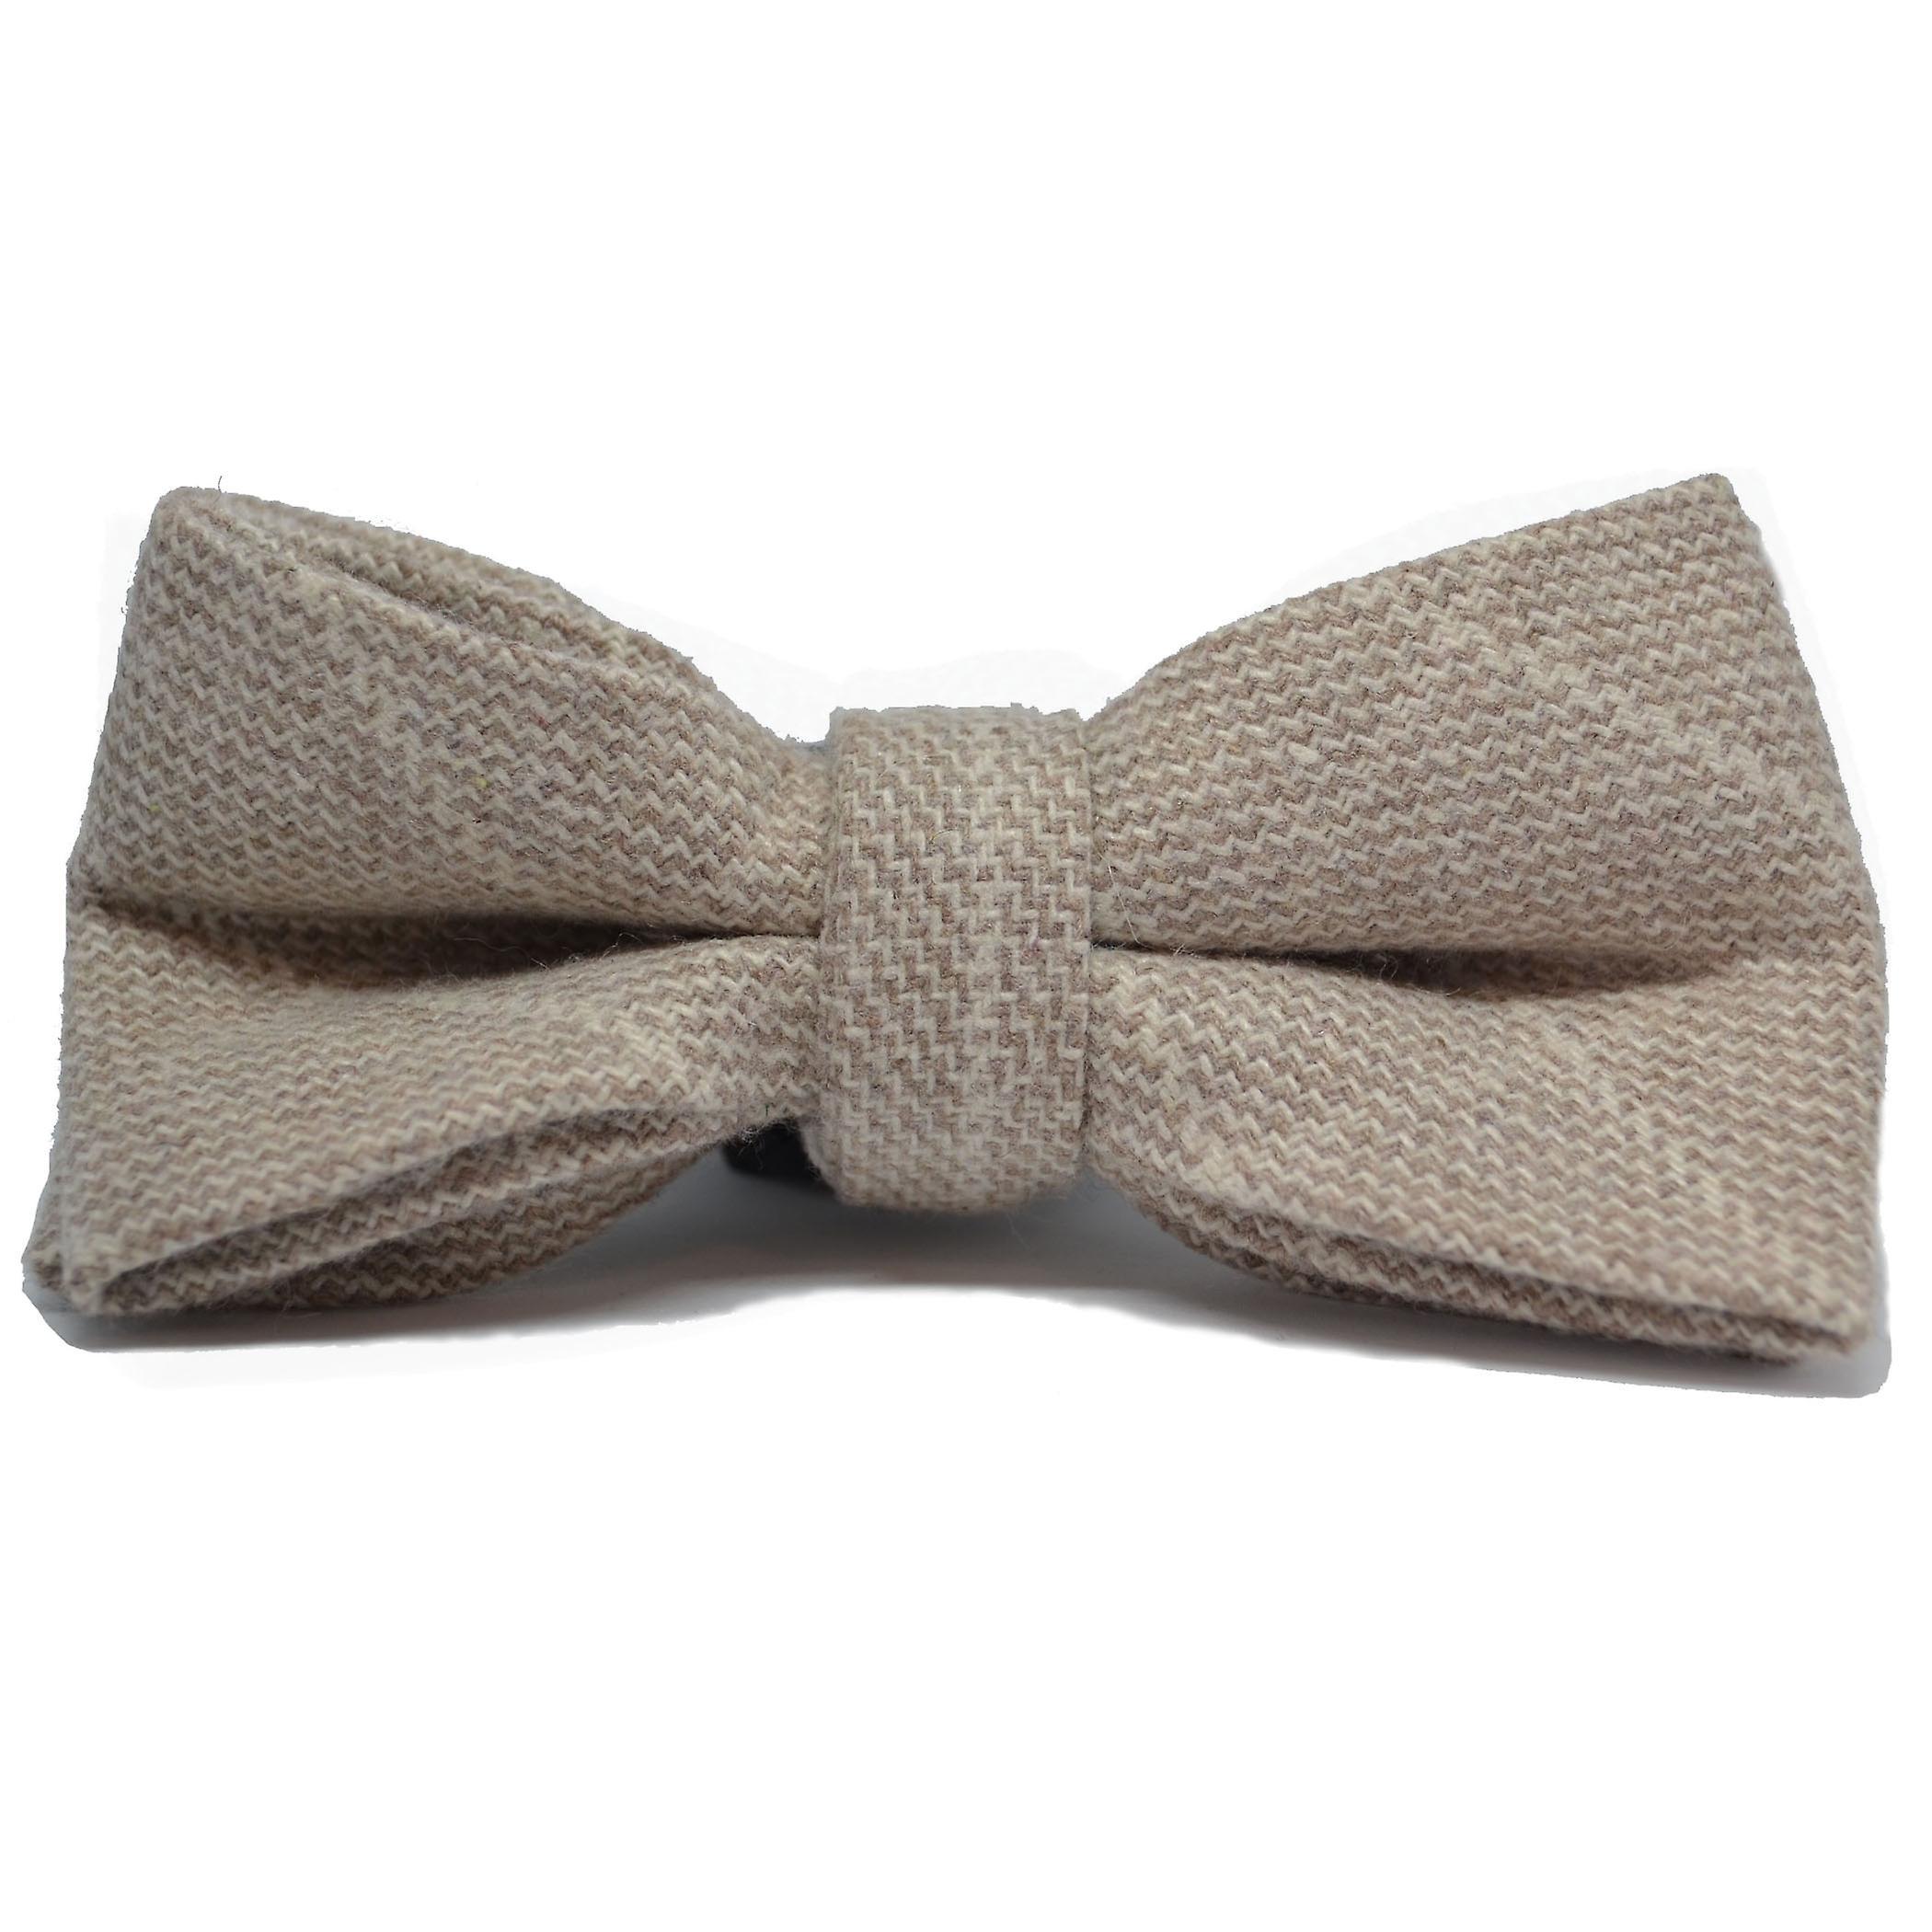 Beige Birdseye Check Bow Tie & Pocket Square Set